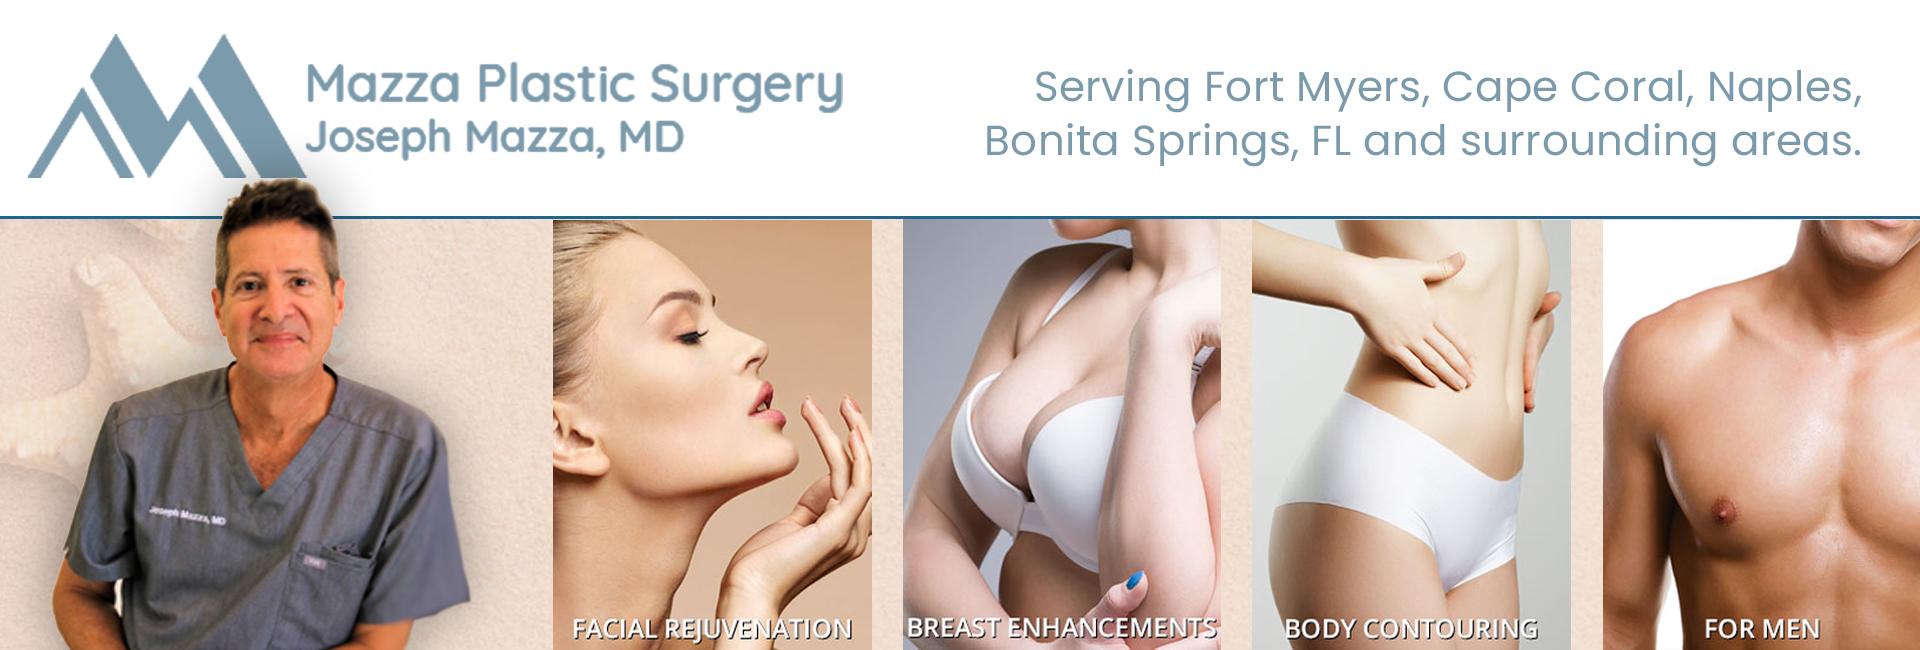 Mazza Plastic Surgery - Joseph Mazza, MD reviews   Dermatology at 12640 Creekside Ln - Fort Myers FL